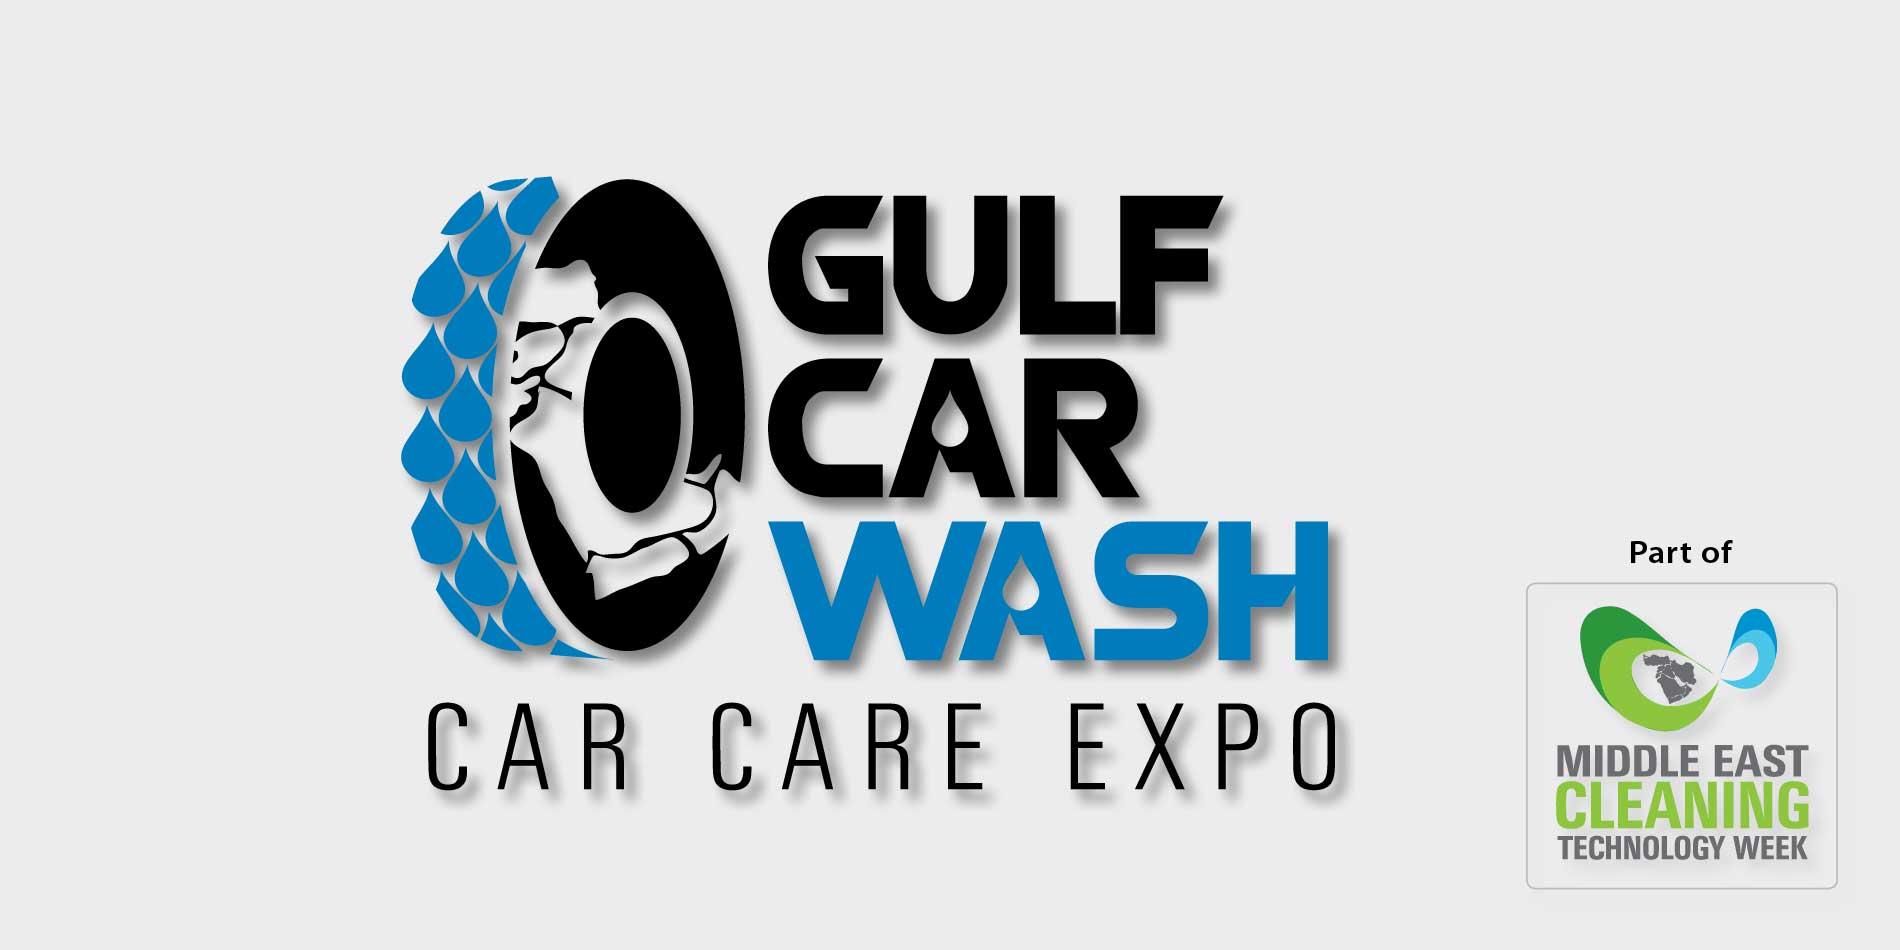 Messebanner der Gulf Car Wash – Car Care Expo